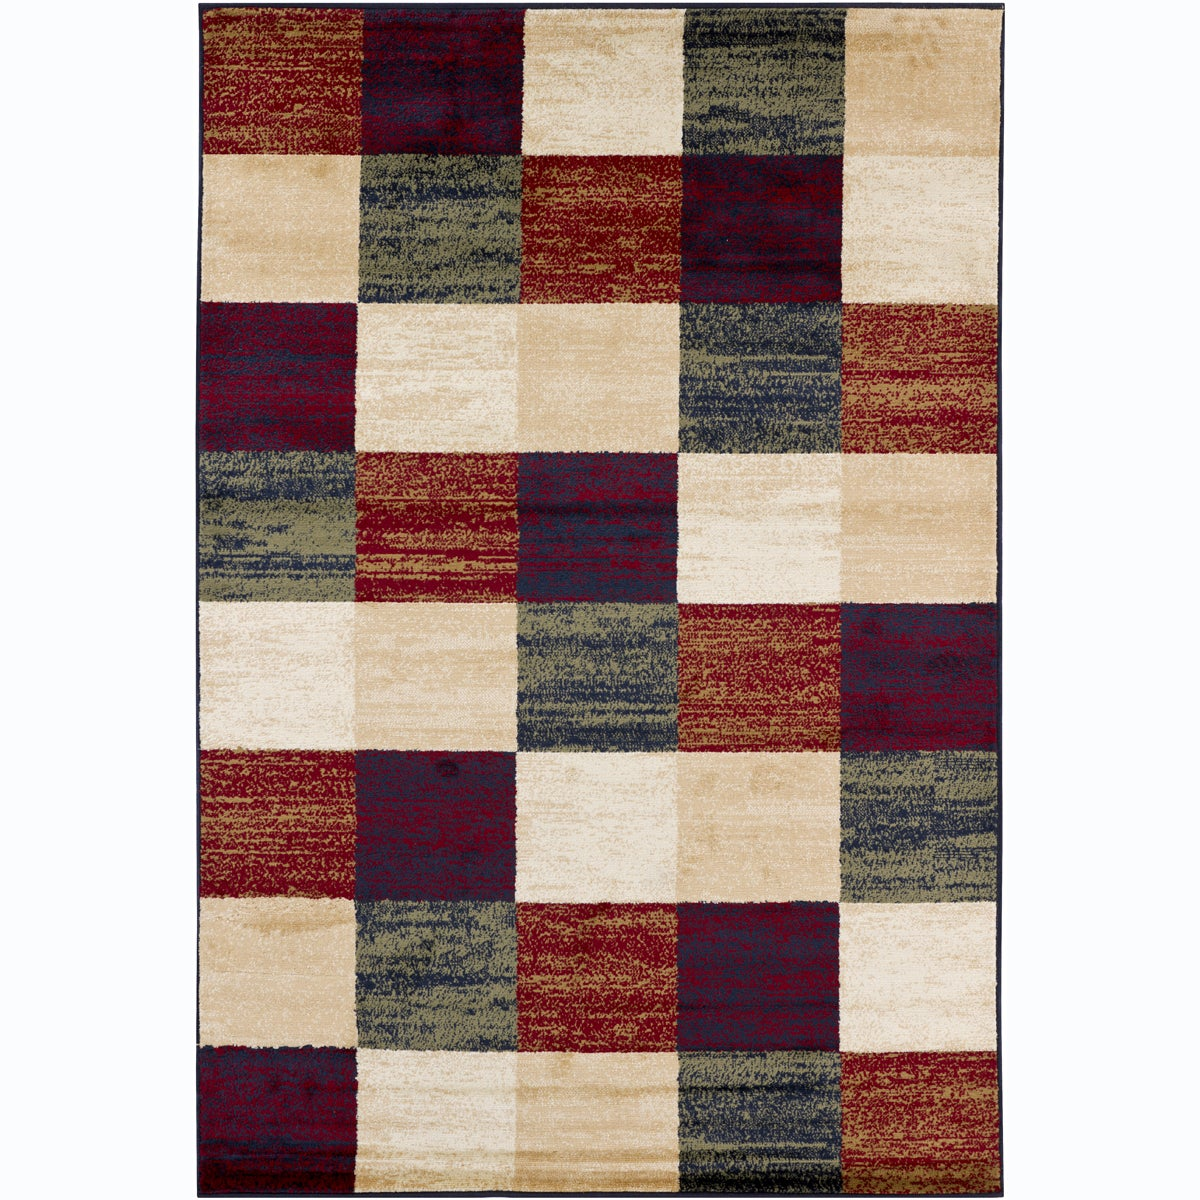 Artist's Loom Indoor Contemporary Geometric Rug - 8' x 11'